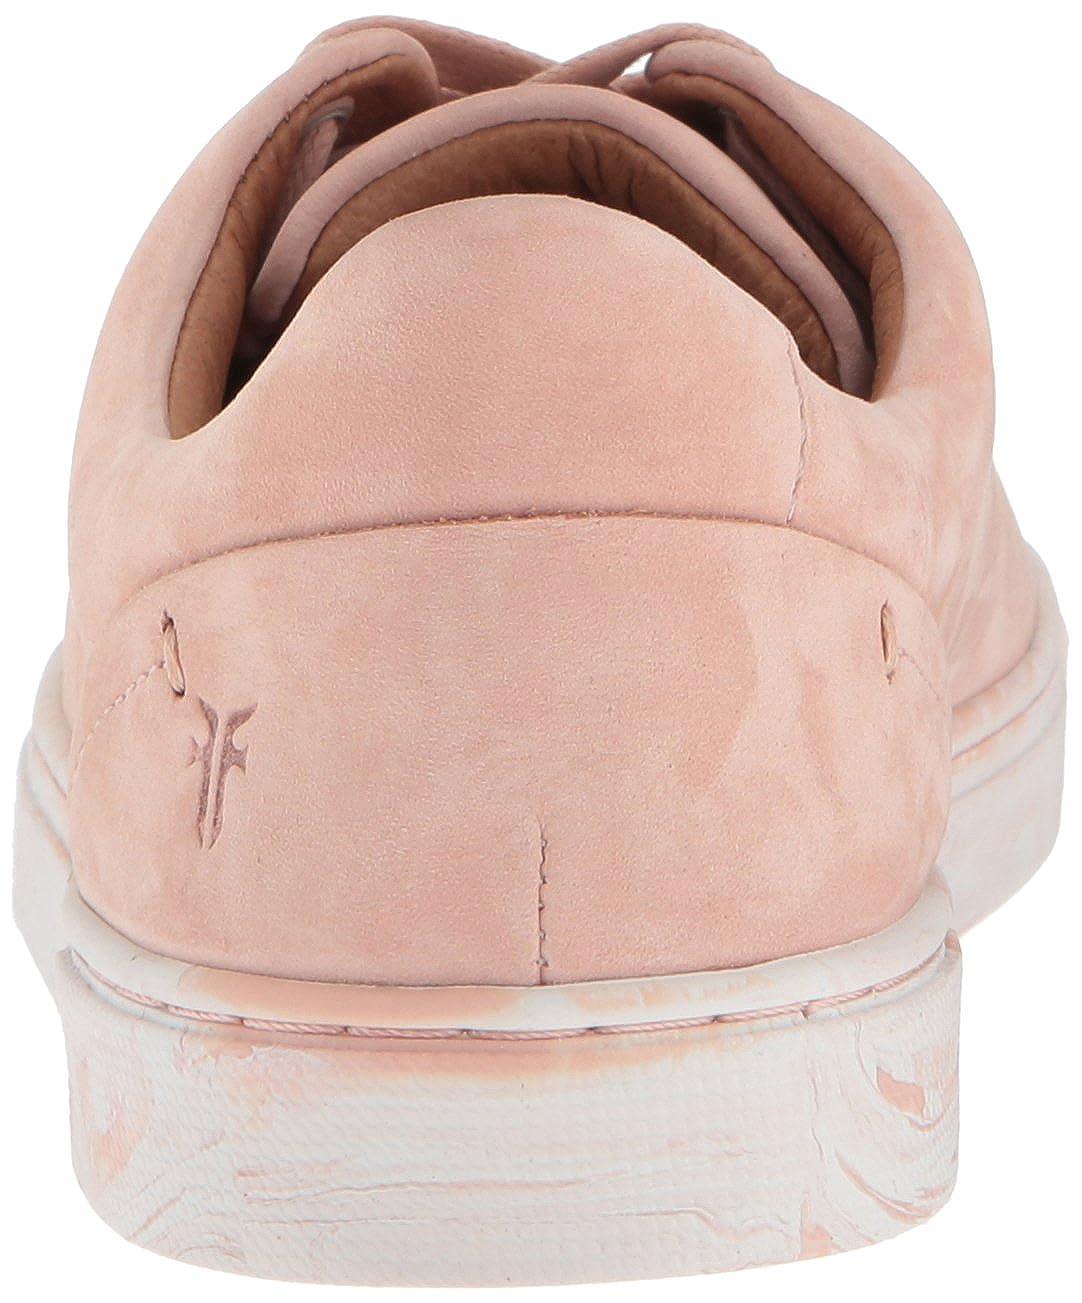 FRYE Womens Ivy Low Lace Fashion Sneaker